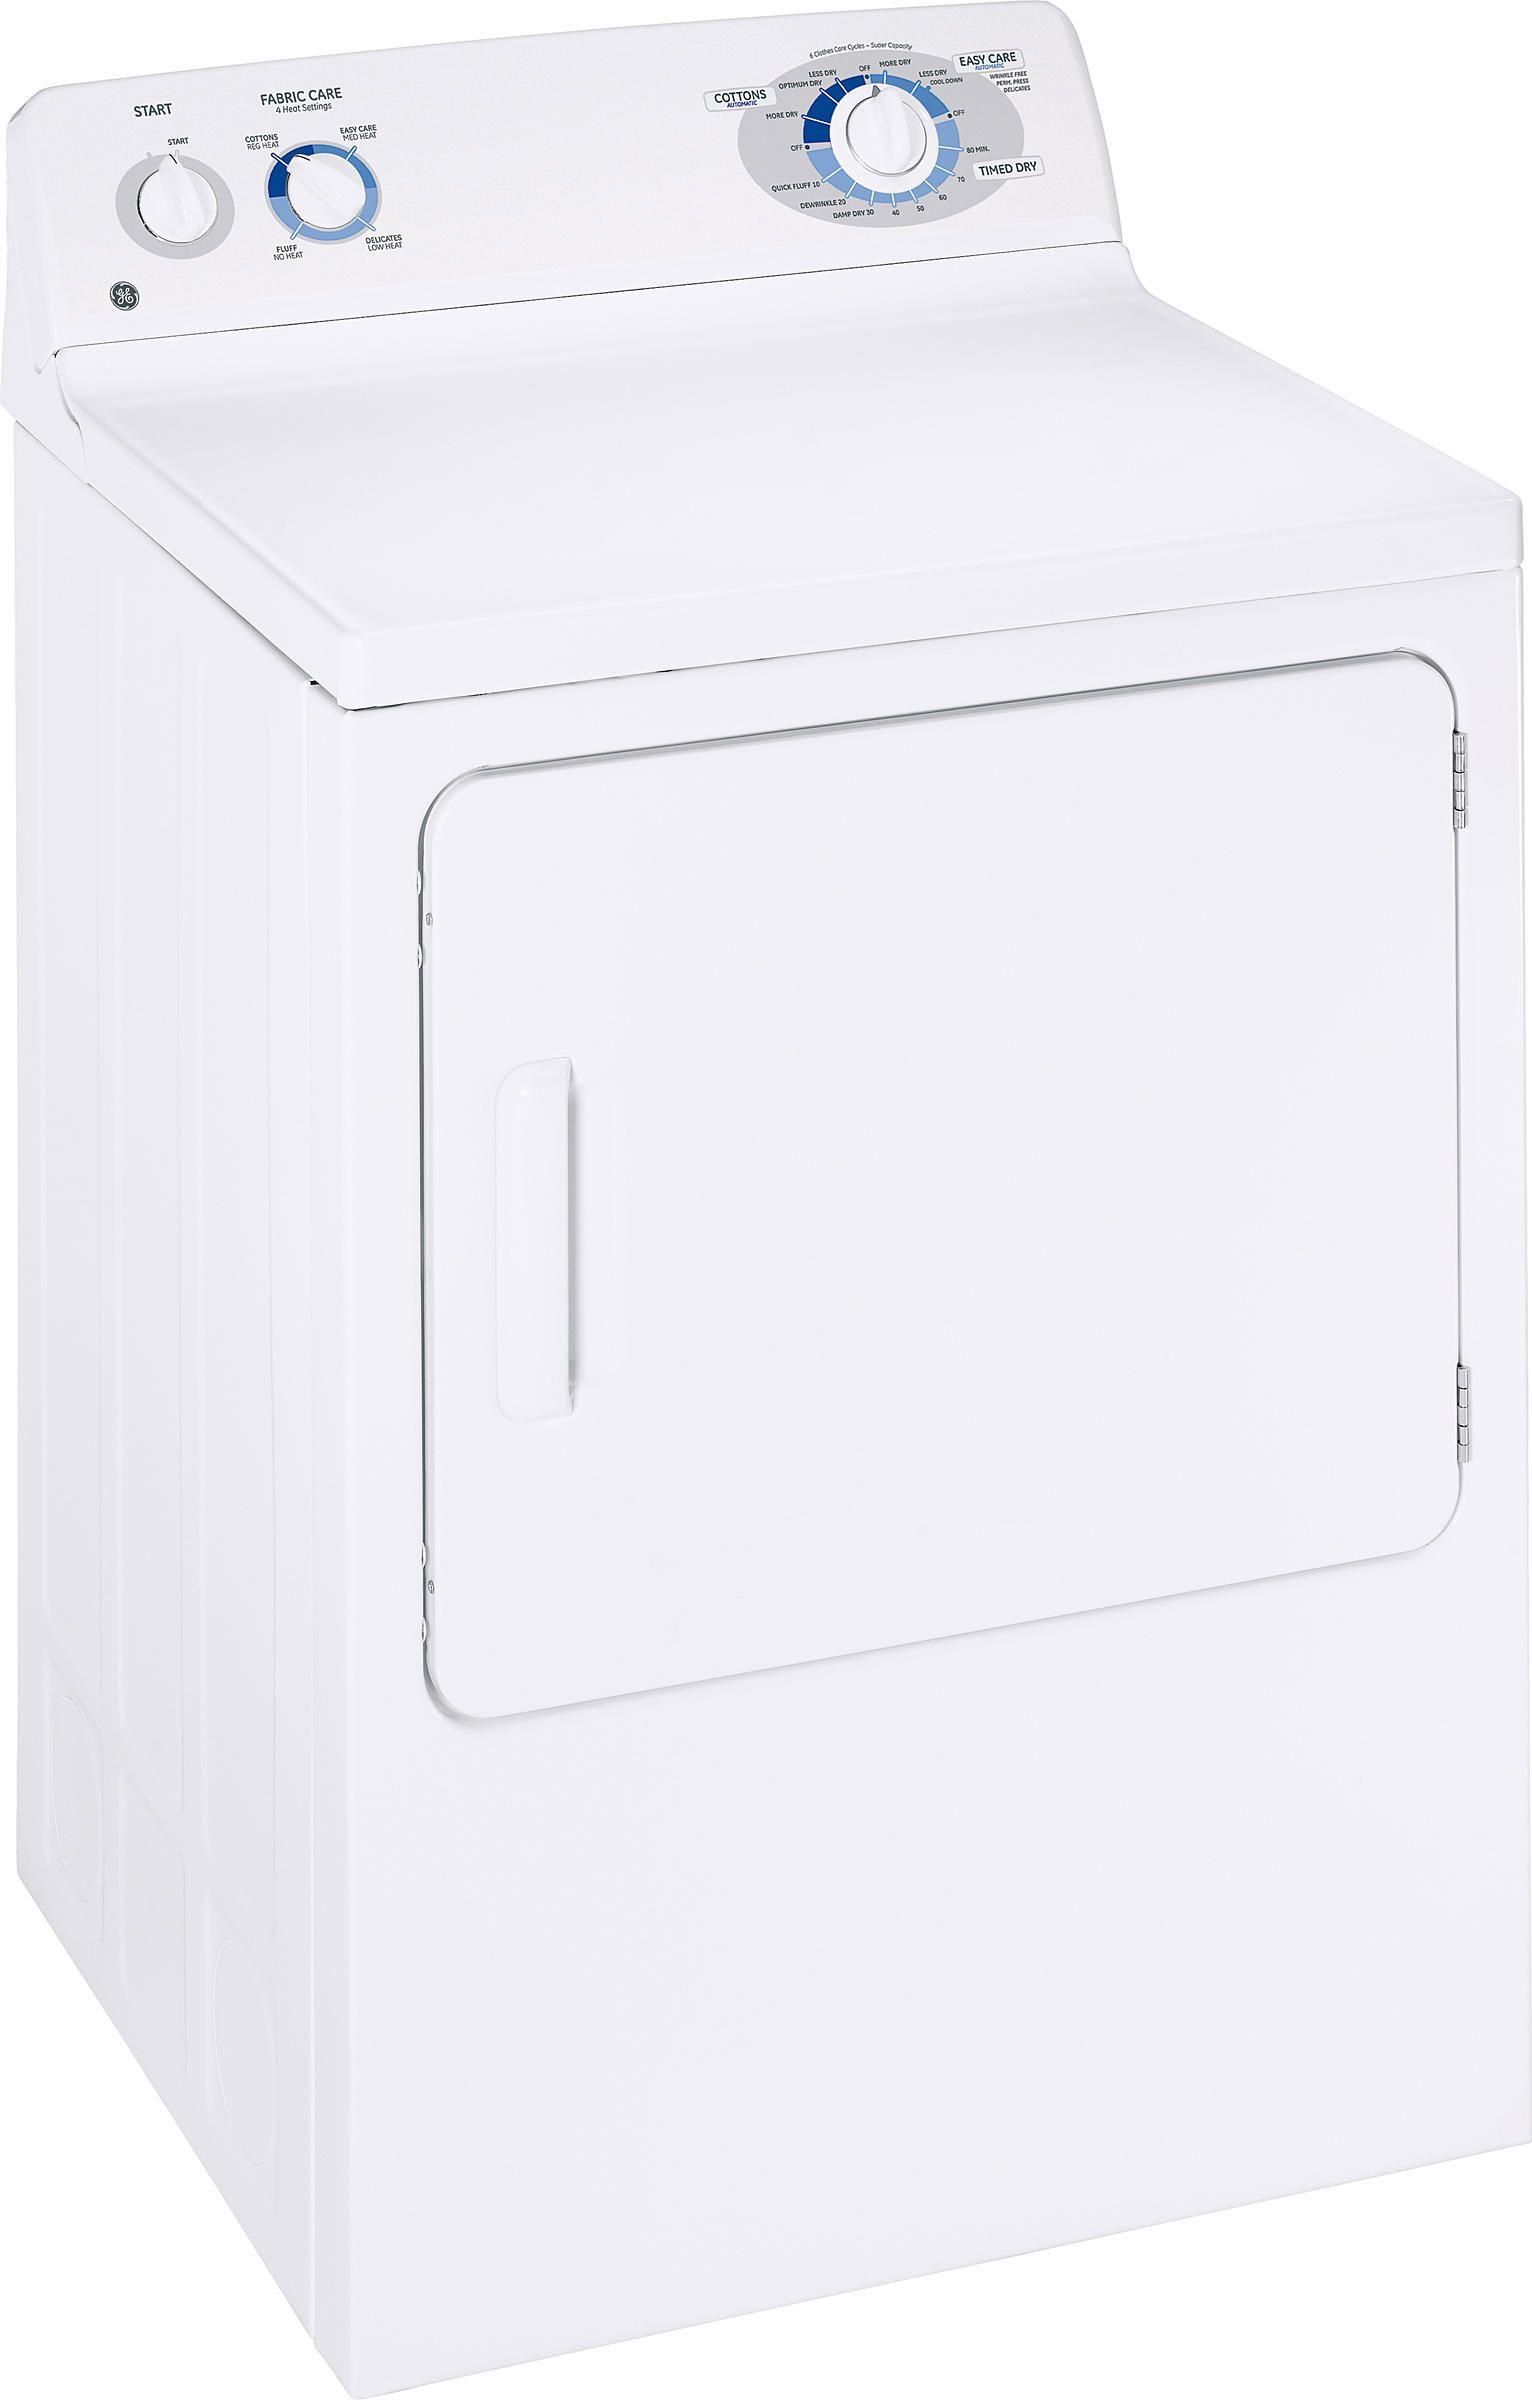 medium resolution of ge model dbxr463eg1ww residential dryer genuine parts rh searspartsdirect com ge dryer repair manual ge front